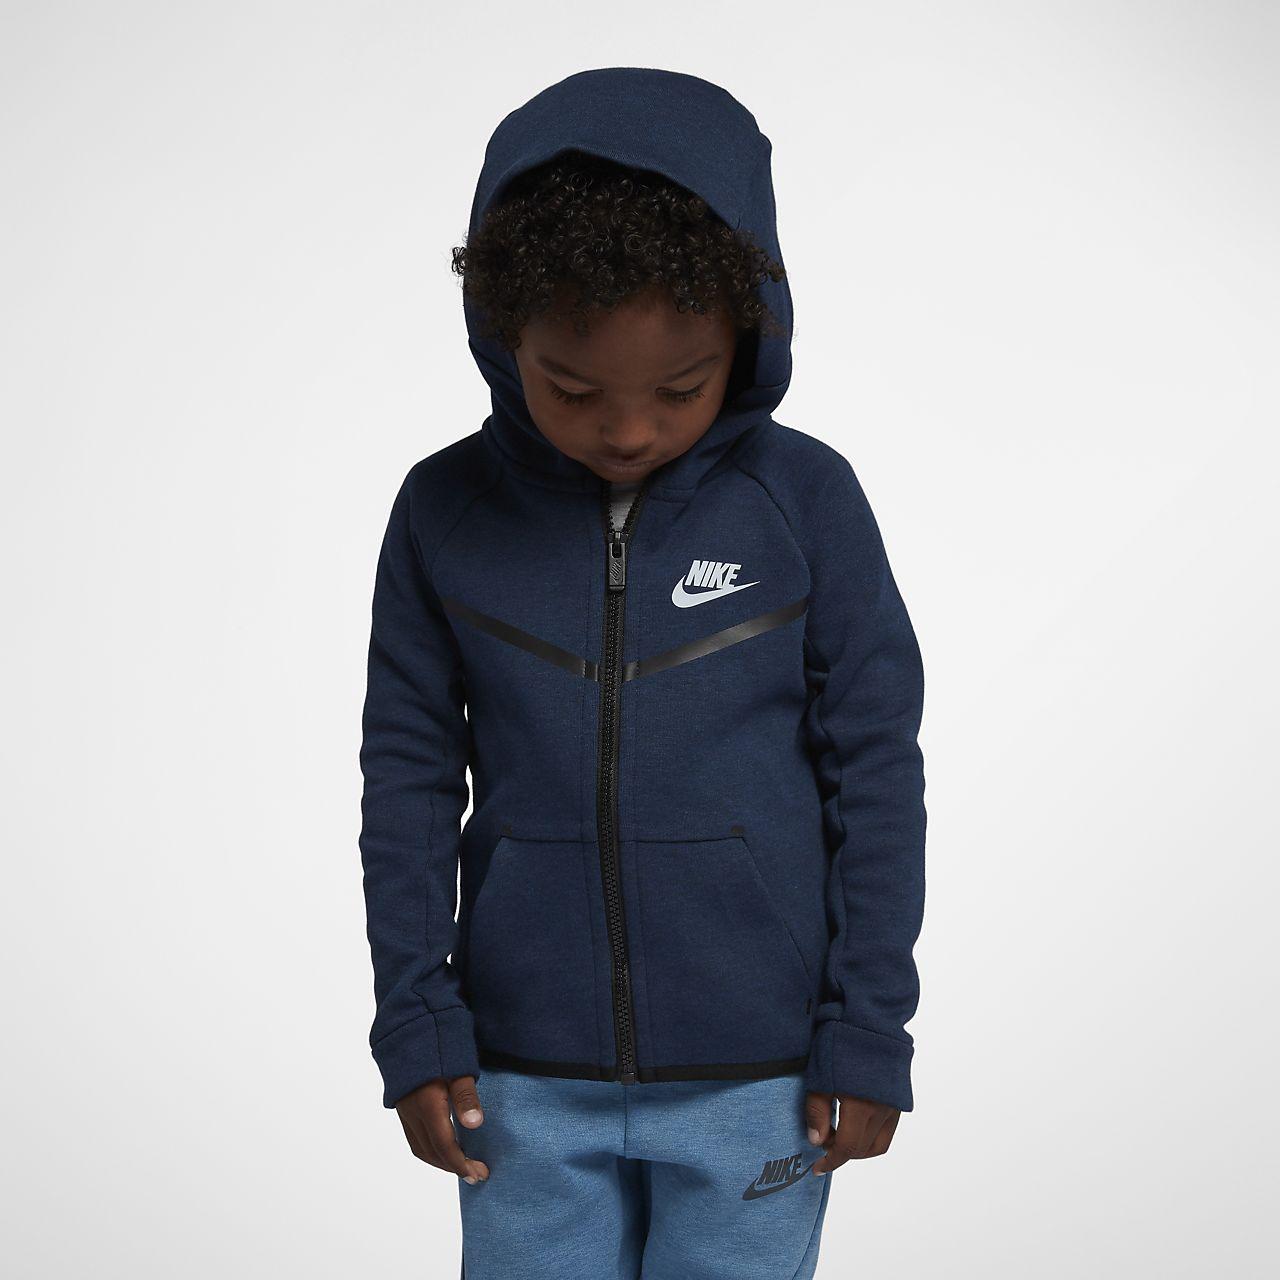 c61c8b0e2a88 Nike Sportswear Tech Fleece Younger Kids  (Boys ) Hoodie. Nike.com IE